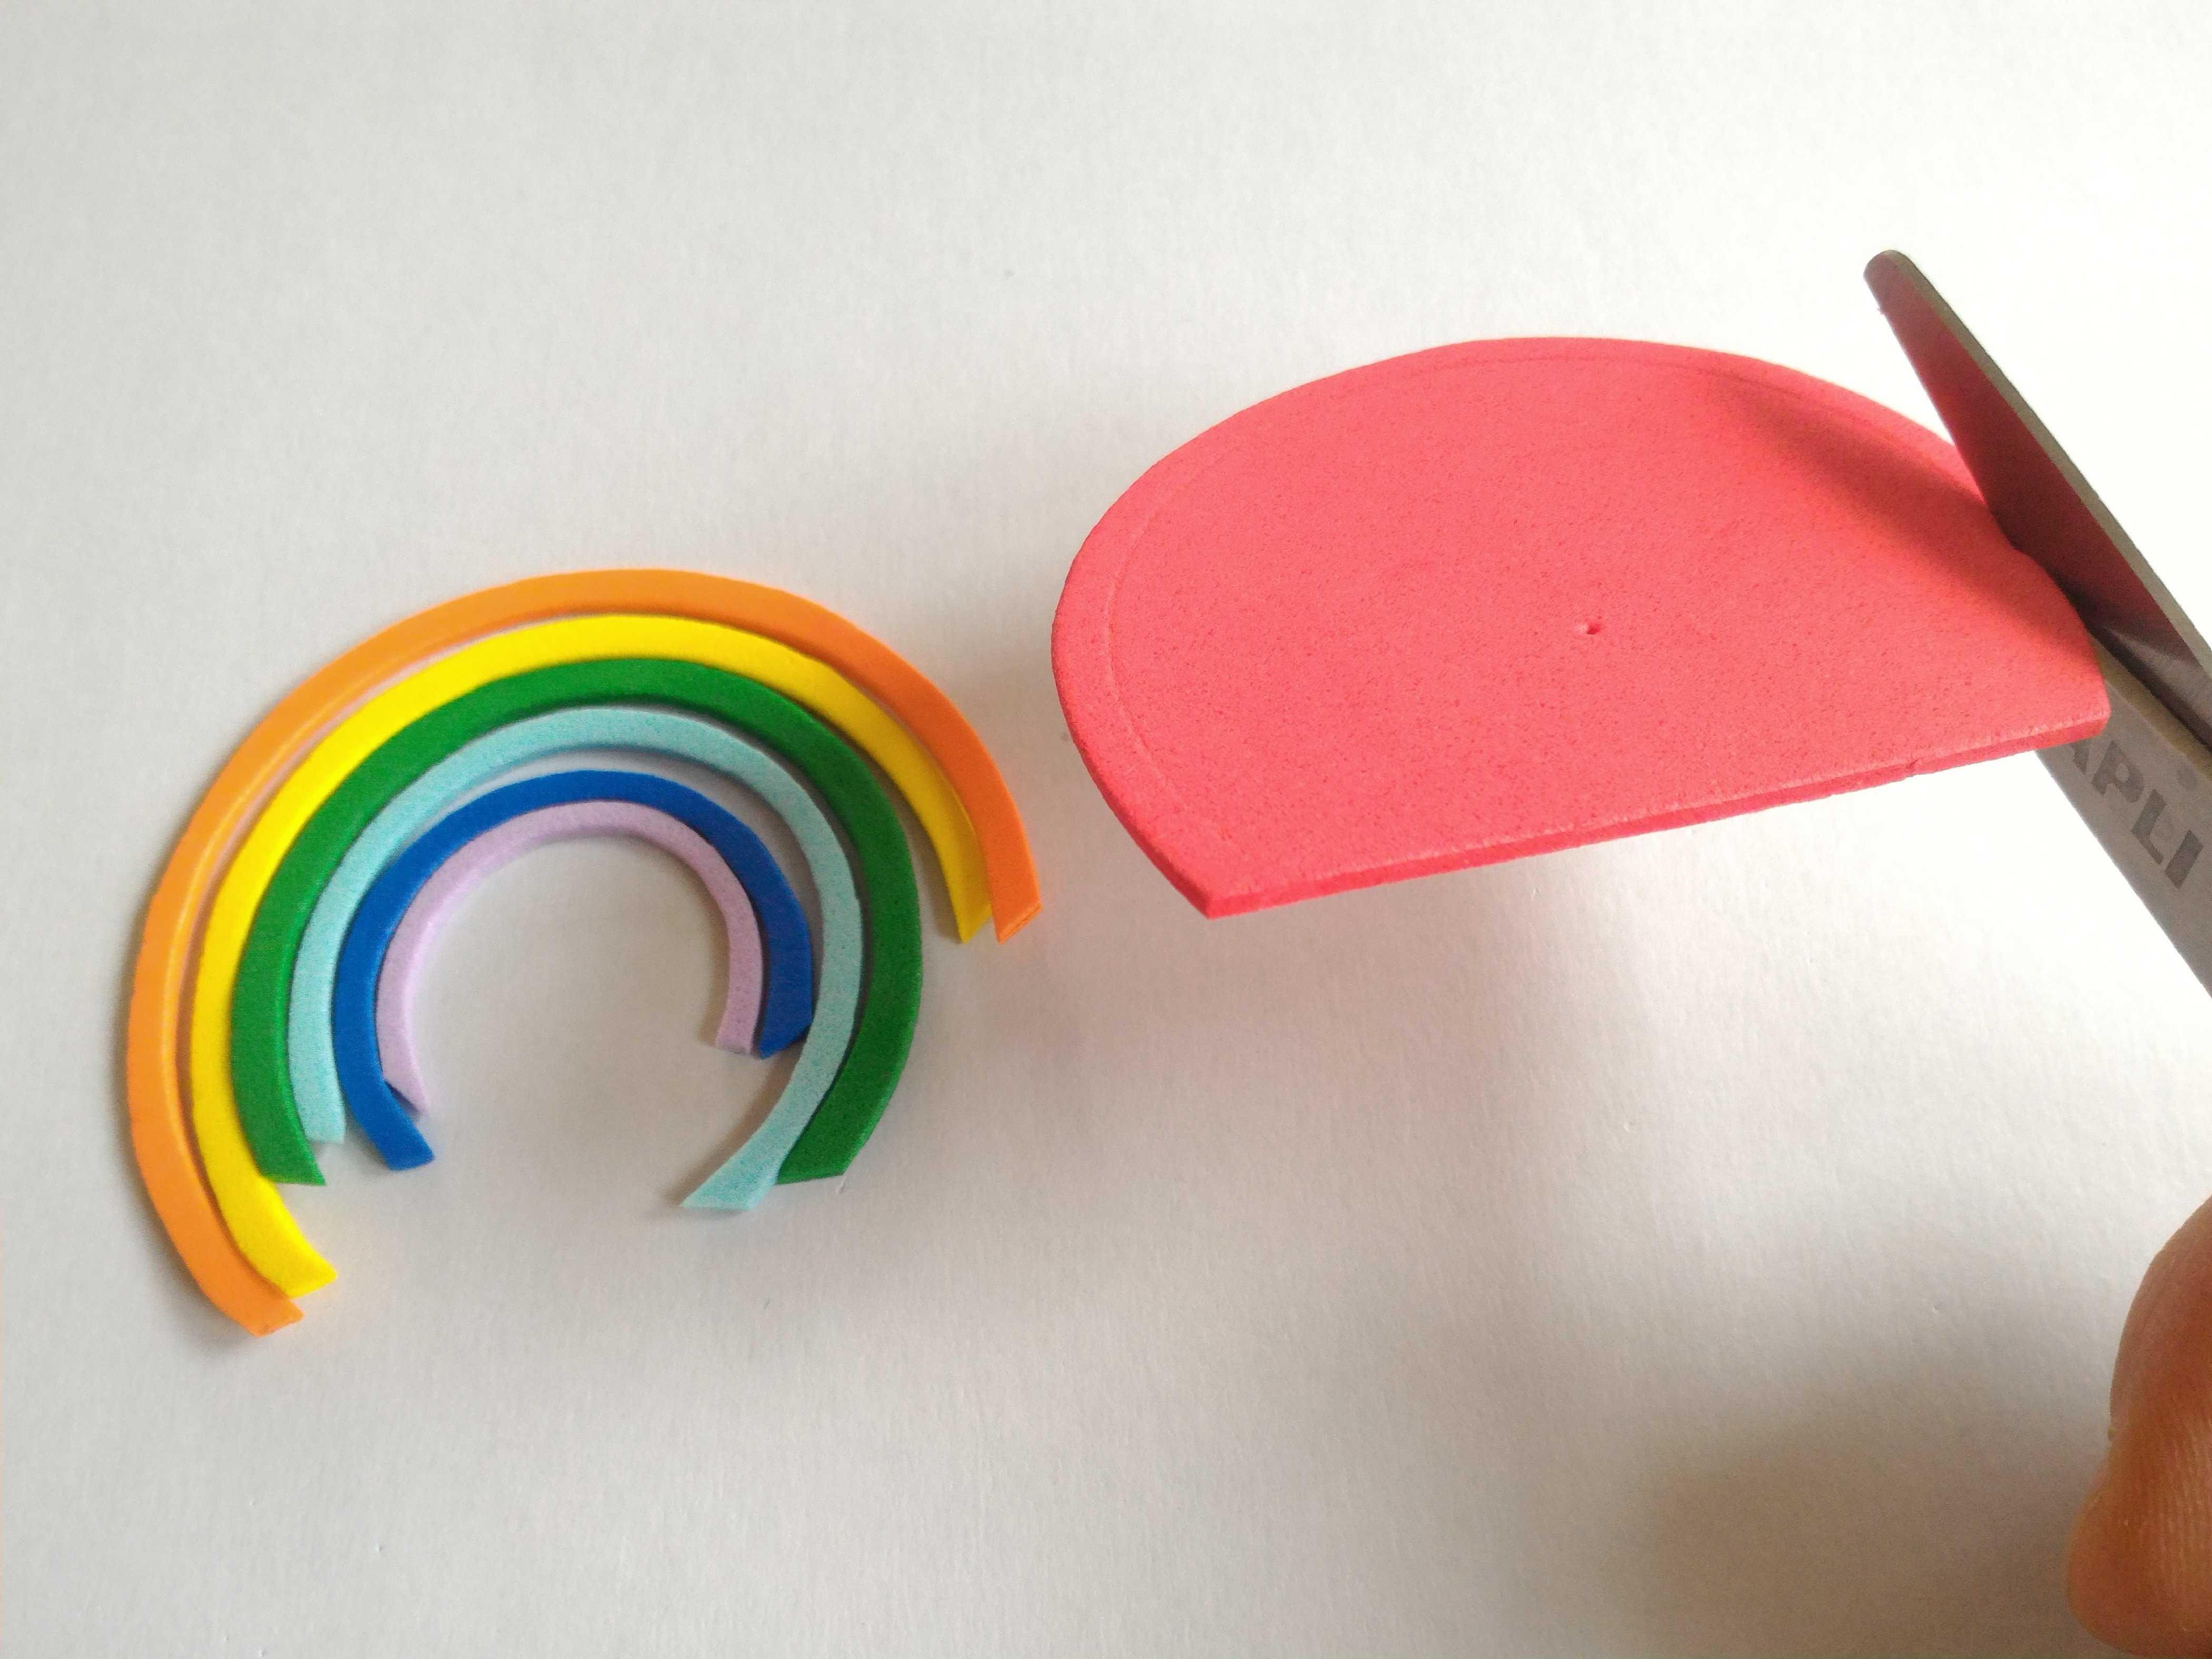 Medium 9   oam   ouiareclafc   rainbow   chagaz et vous